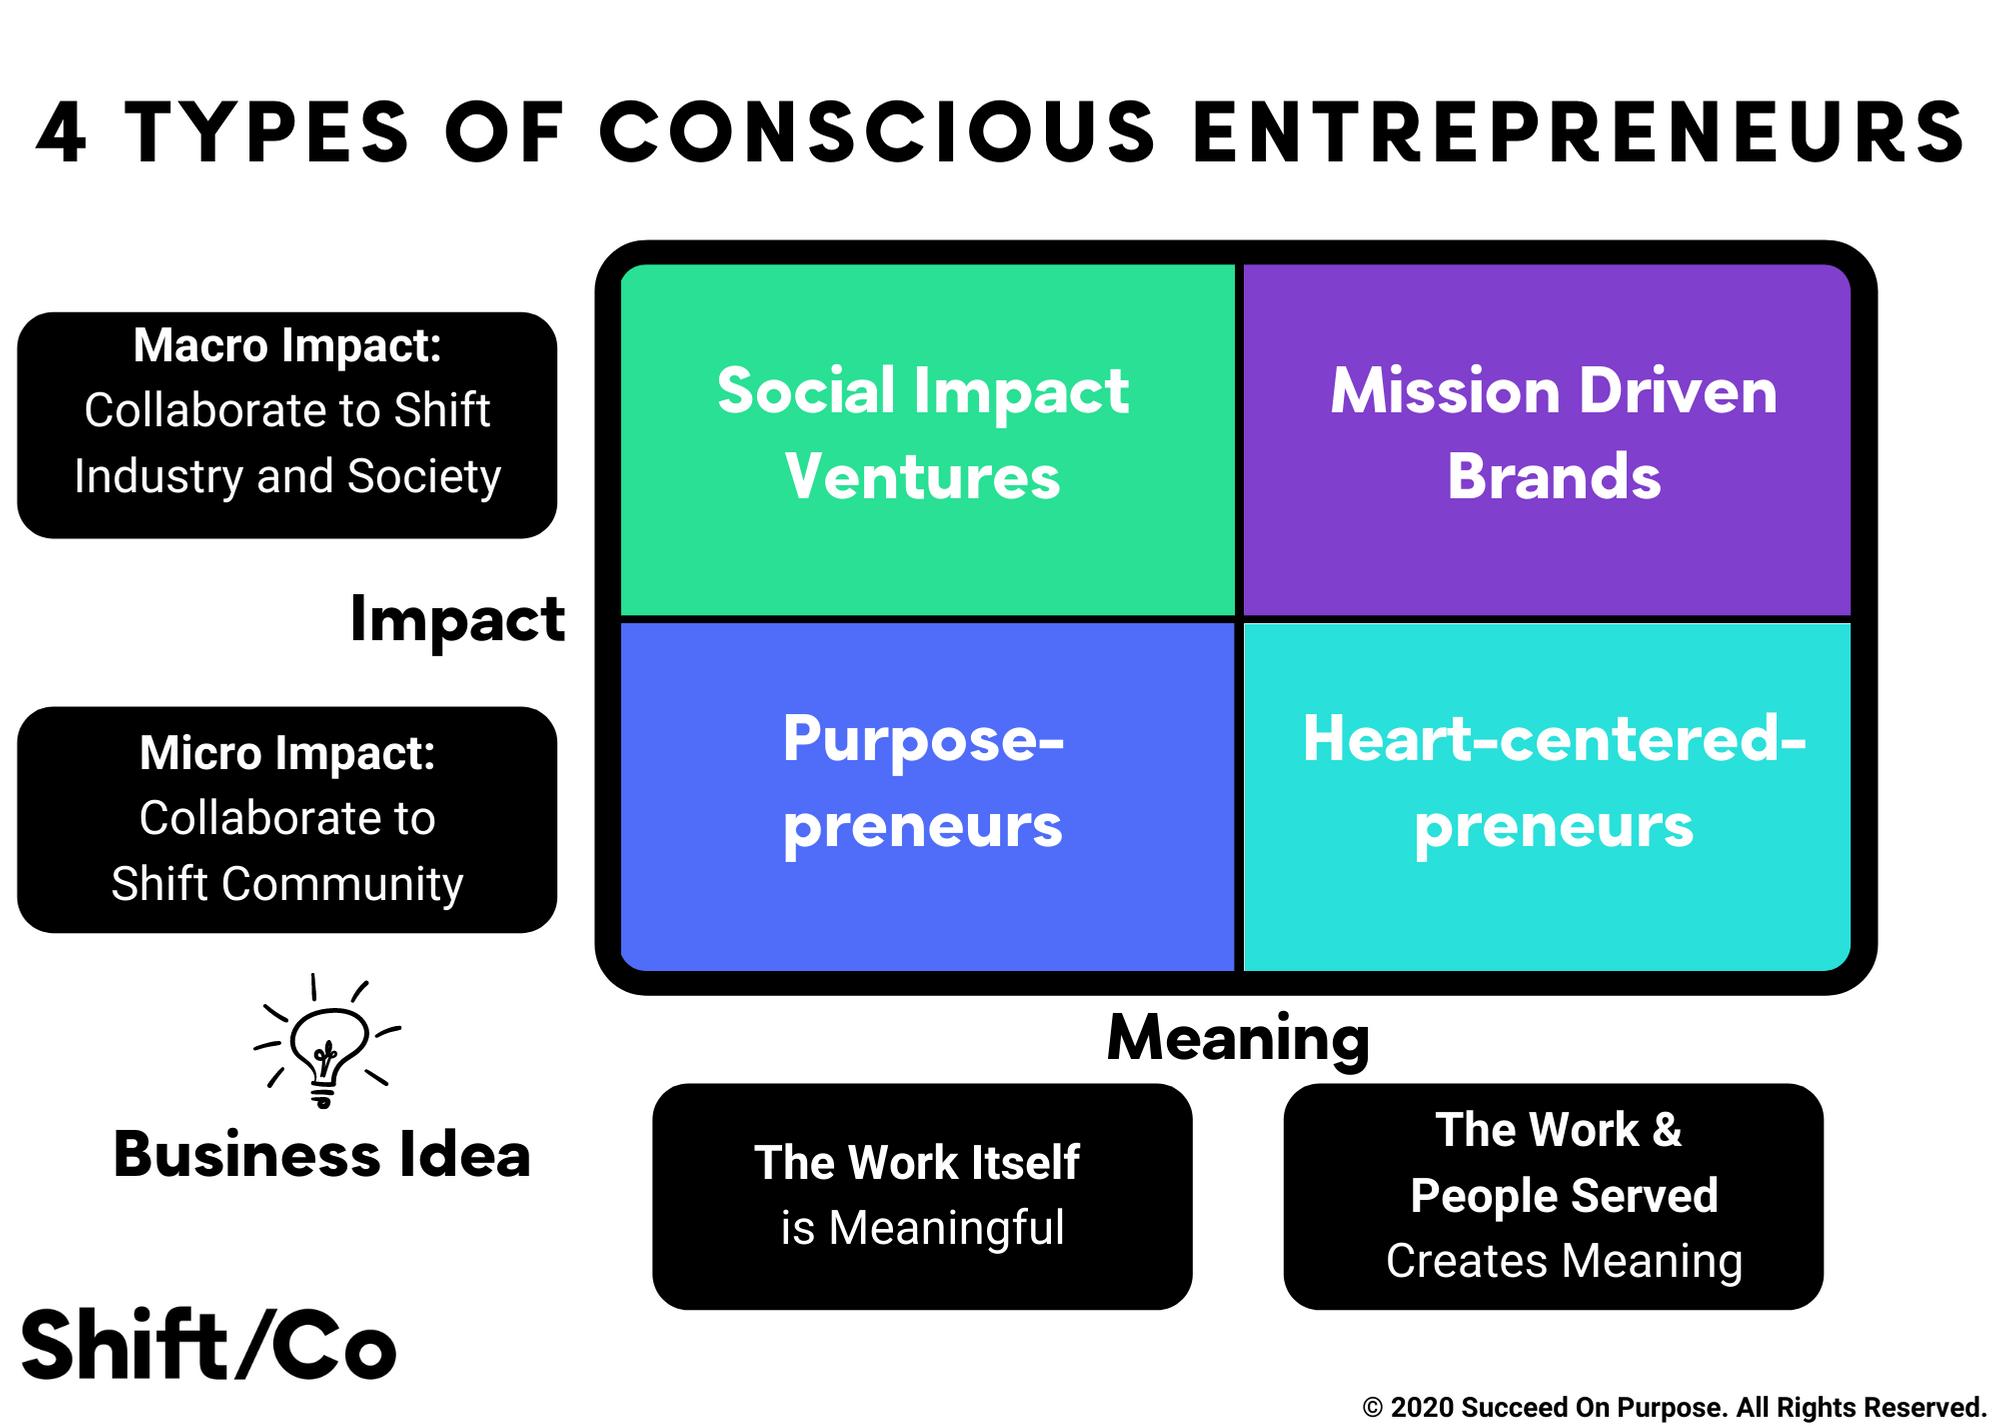 types of conscious entrepreneurs